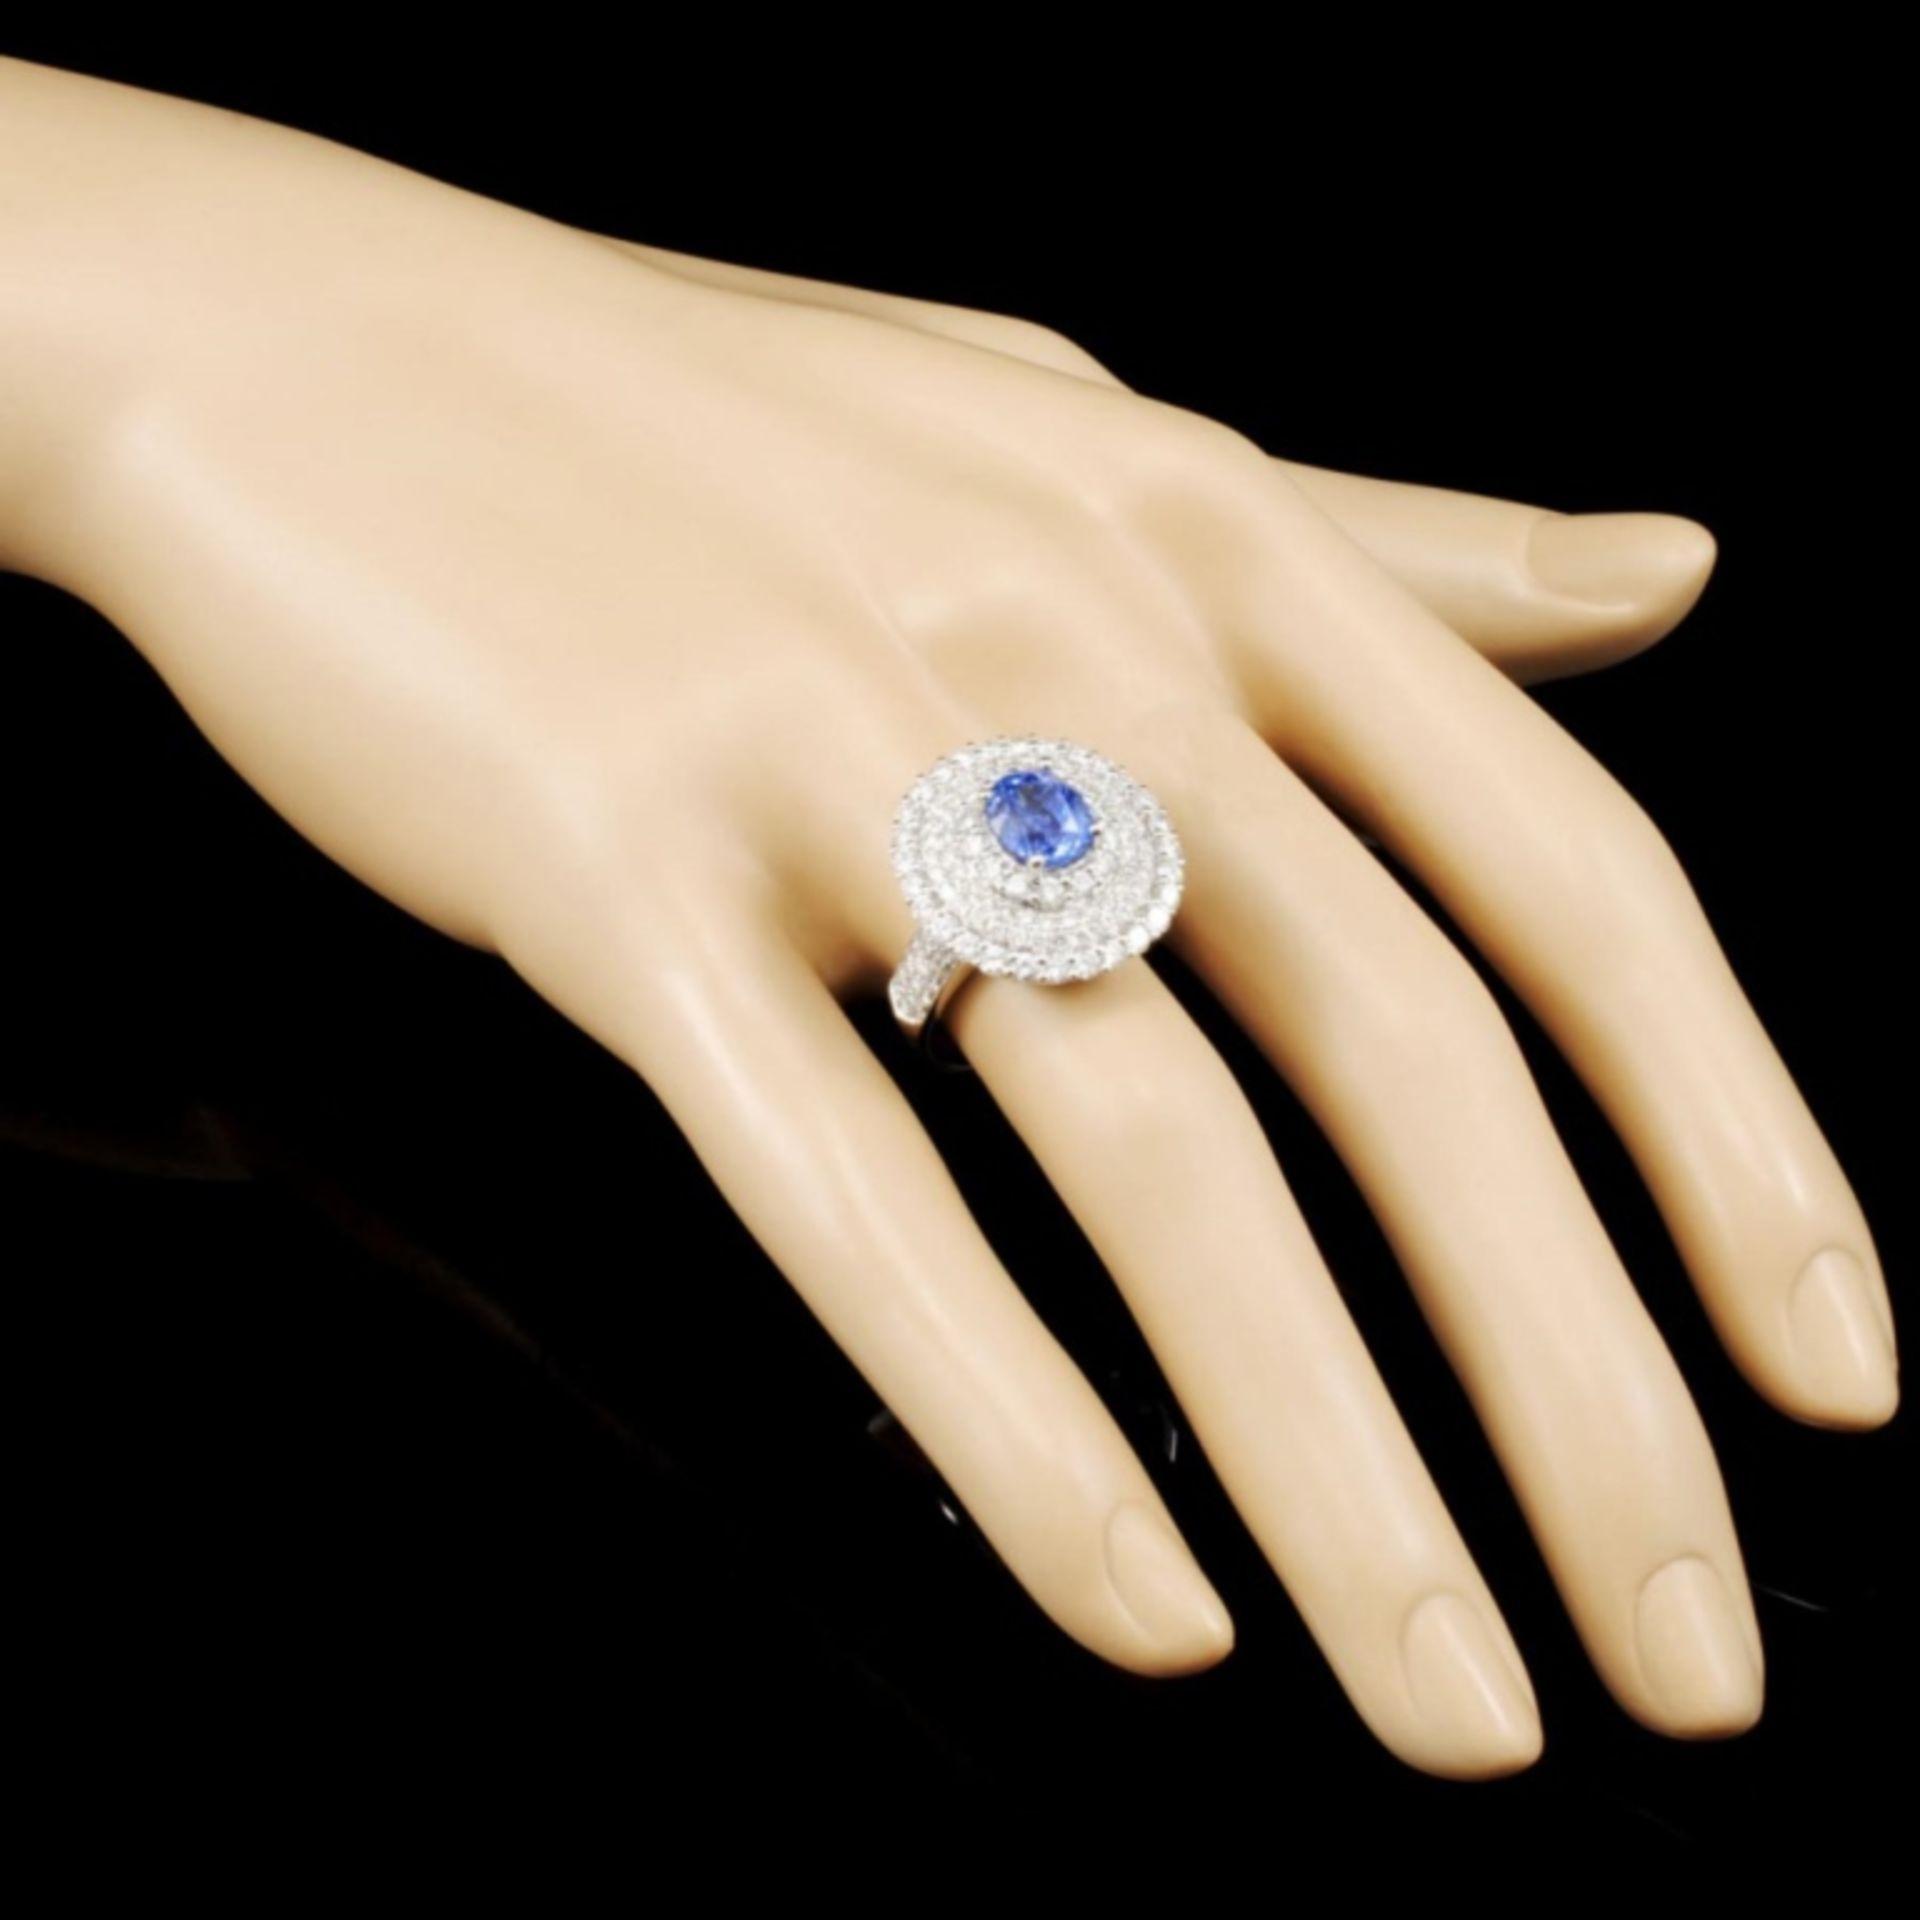 18K Gold 2.71ct Sapphire & 2.52ctw Diamond Ring - Image 3 of 5